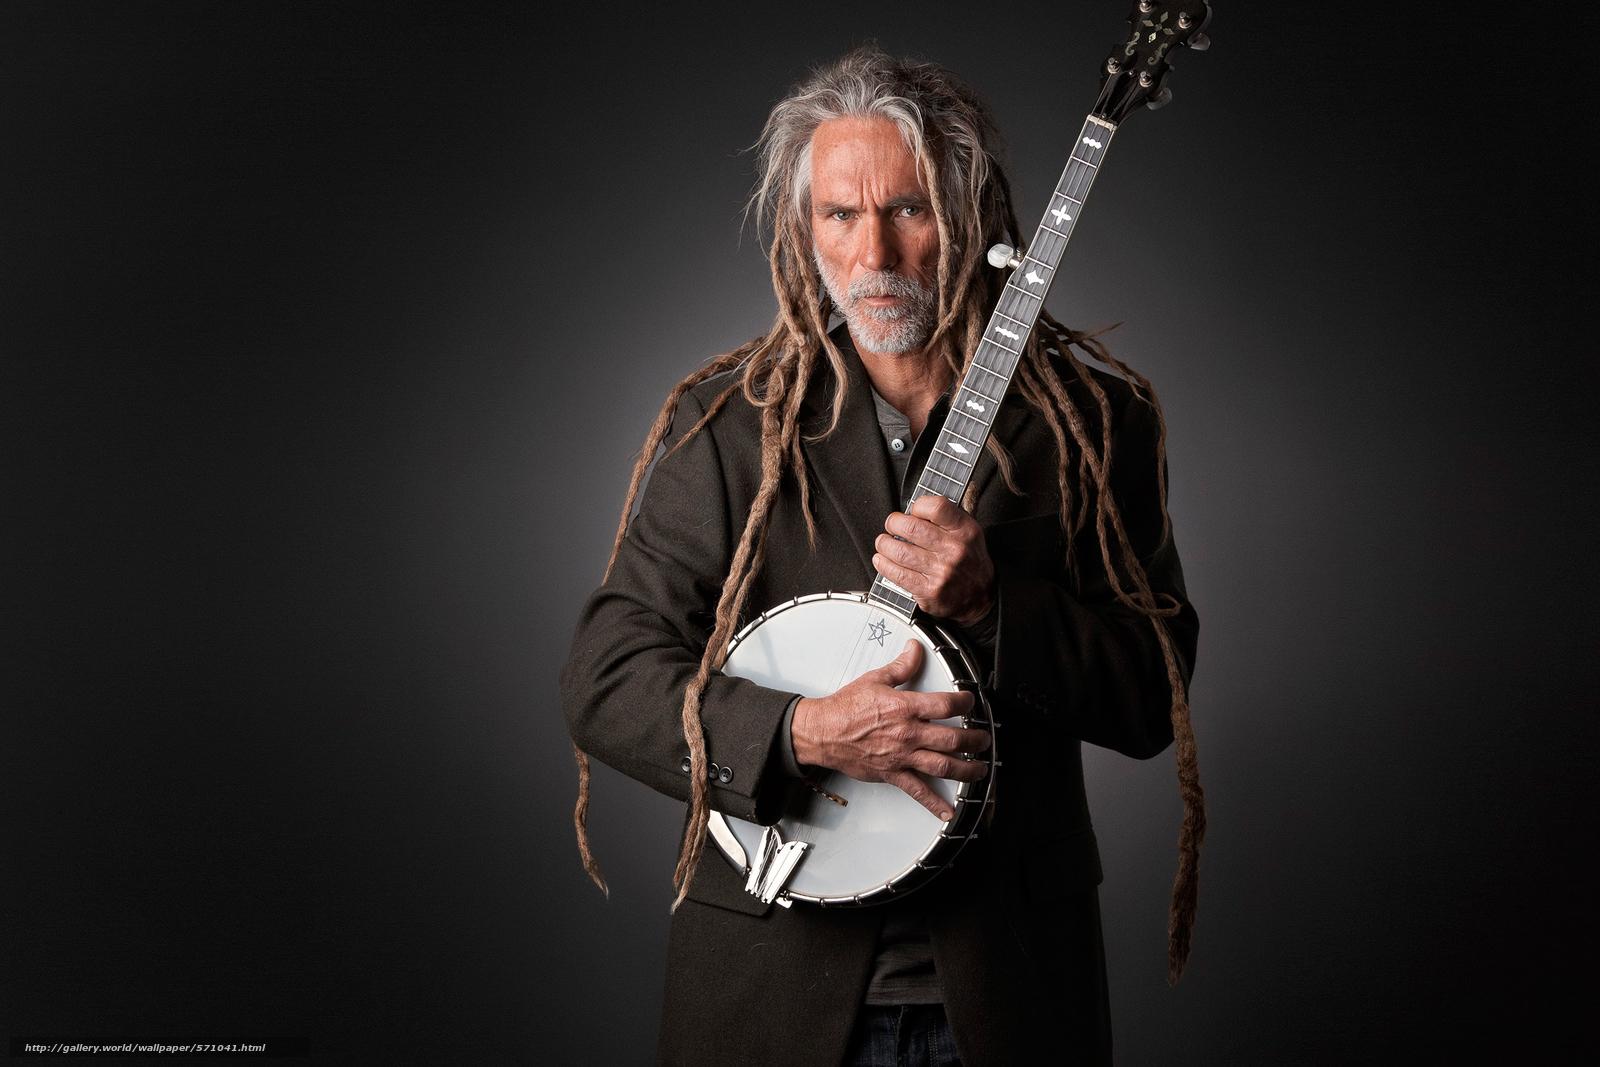 Tlcharger fond decran banjo studio musicien portrait fonds d